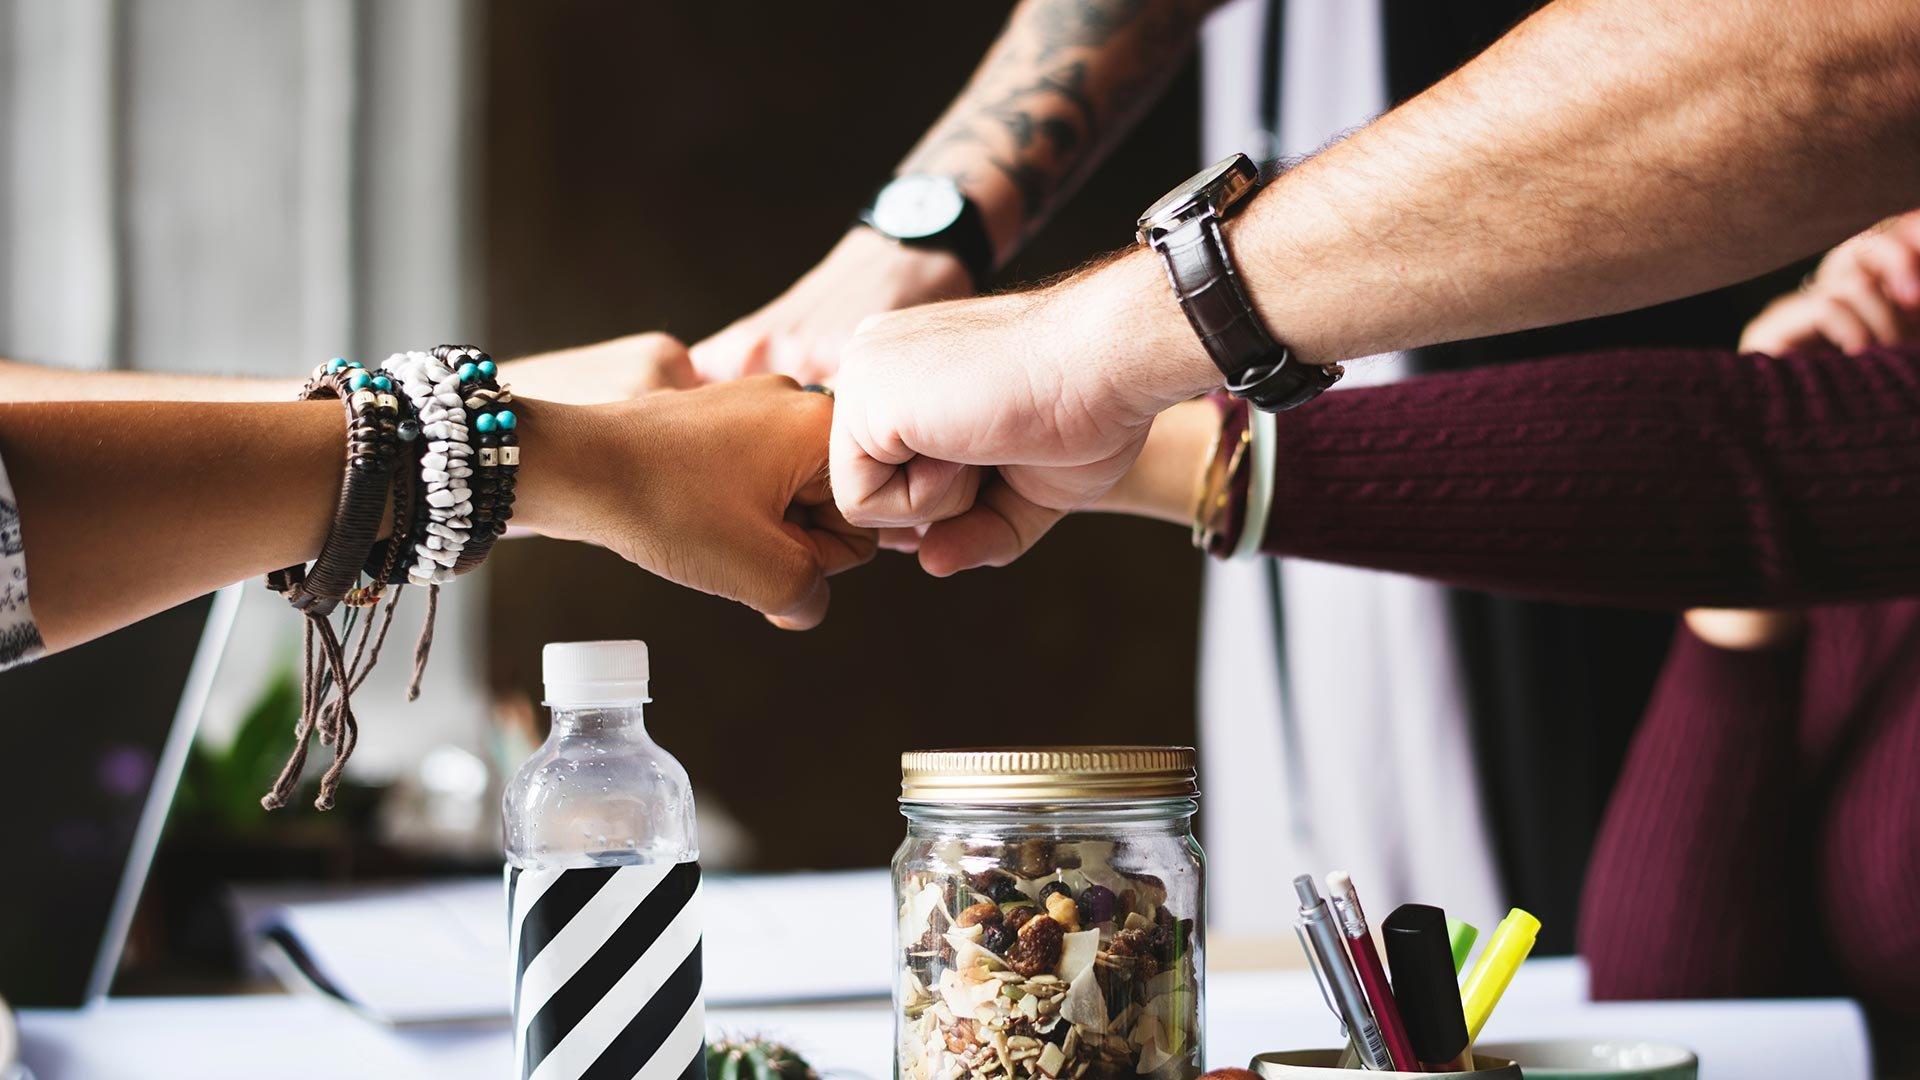 DevOps supports software development teams